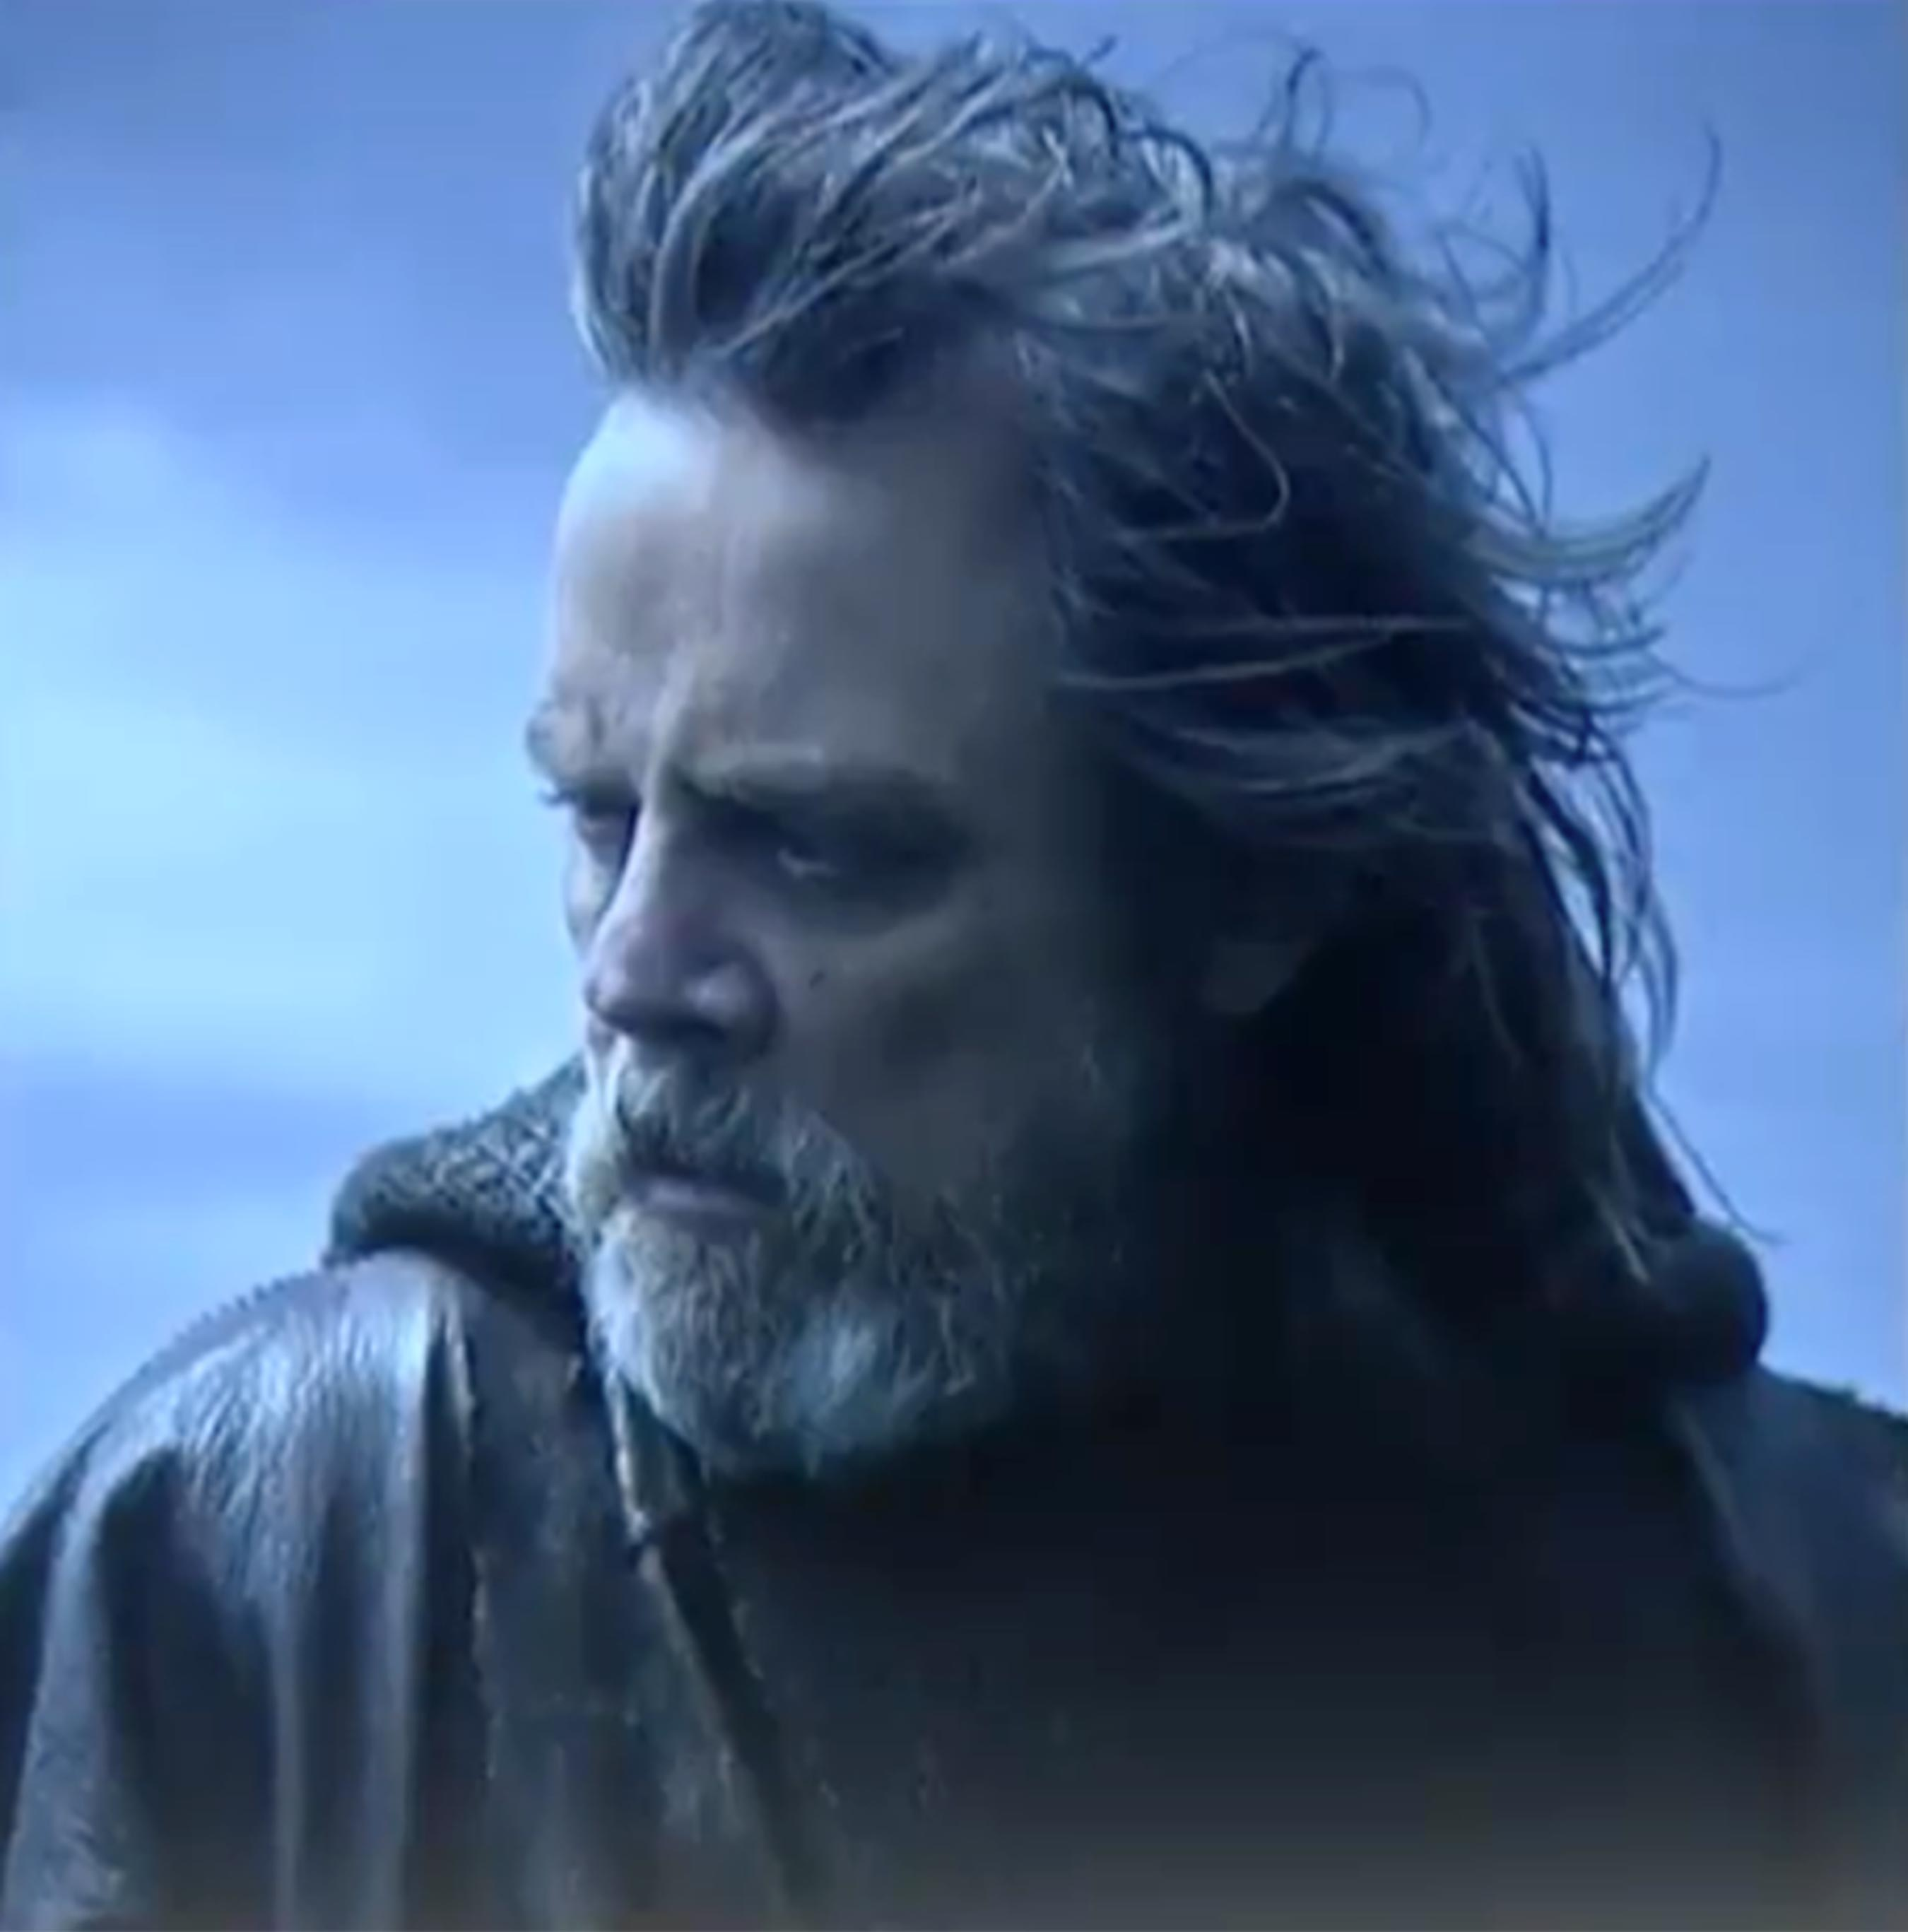 Star Wars: Gli ultimi Jedi - Un'immagine di Luke Skywalker